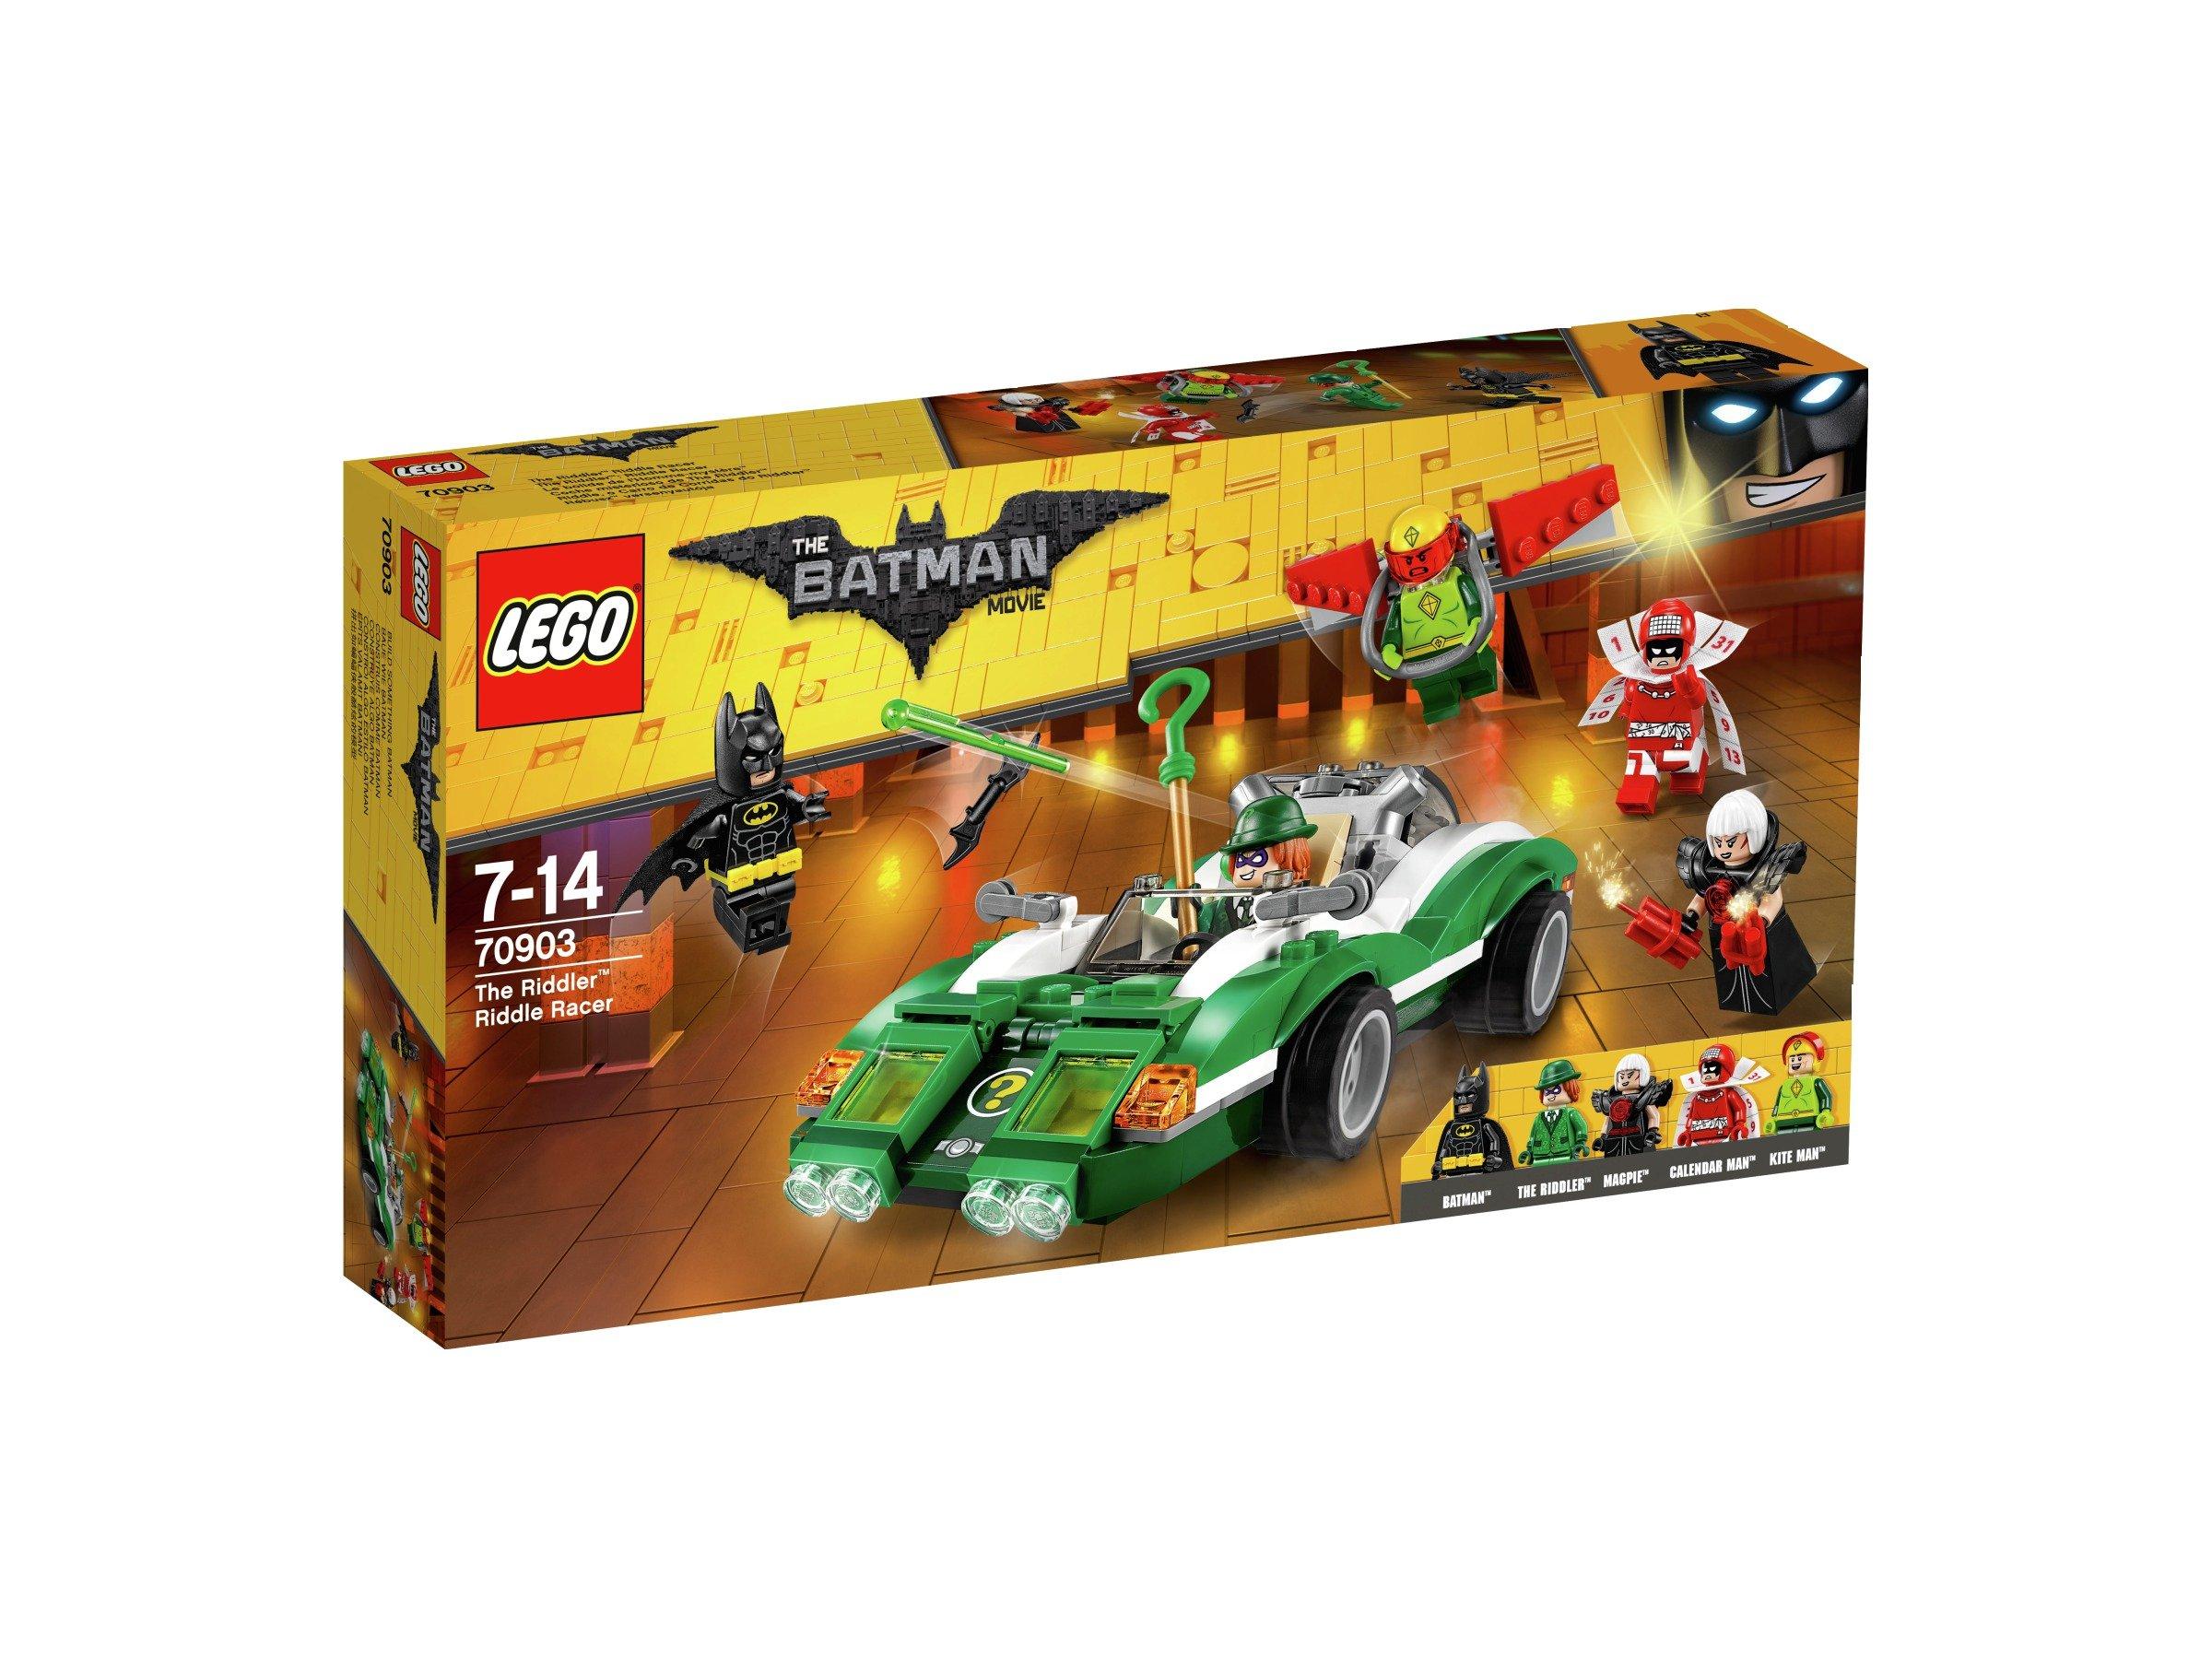 LEGO Batman Movie Riddler - 70903.